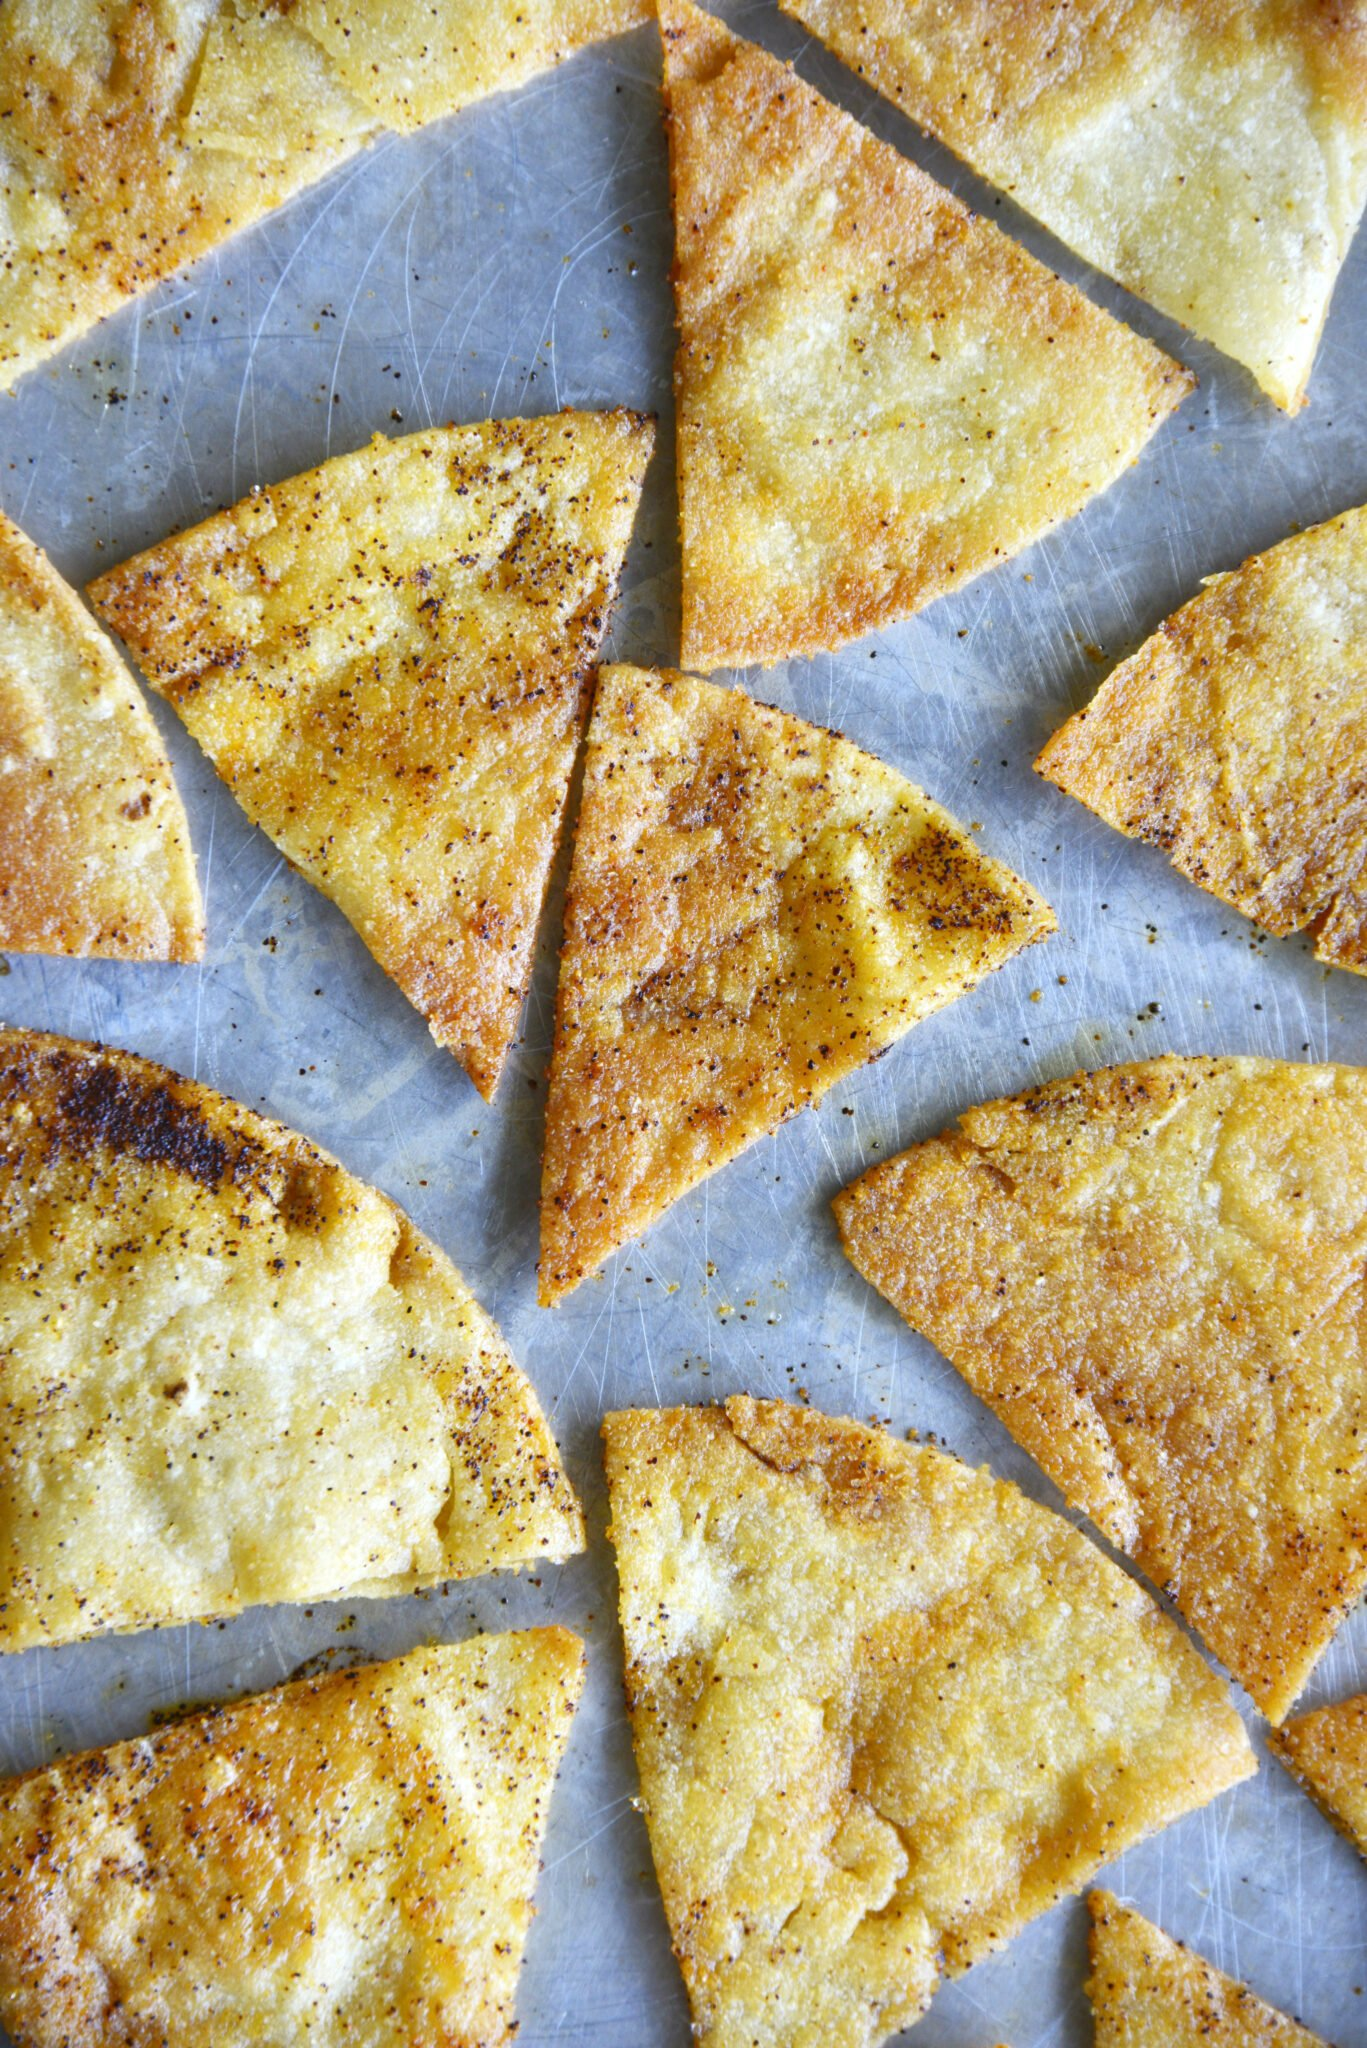 a sheet pan of baked tortilla chips